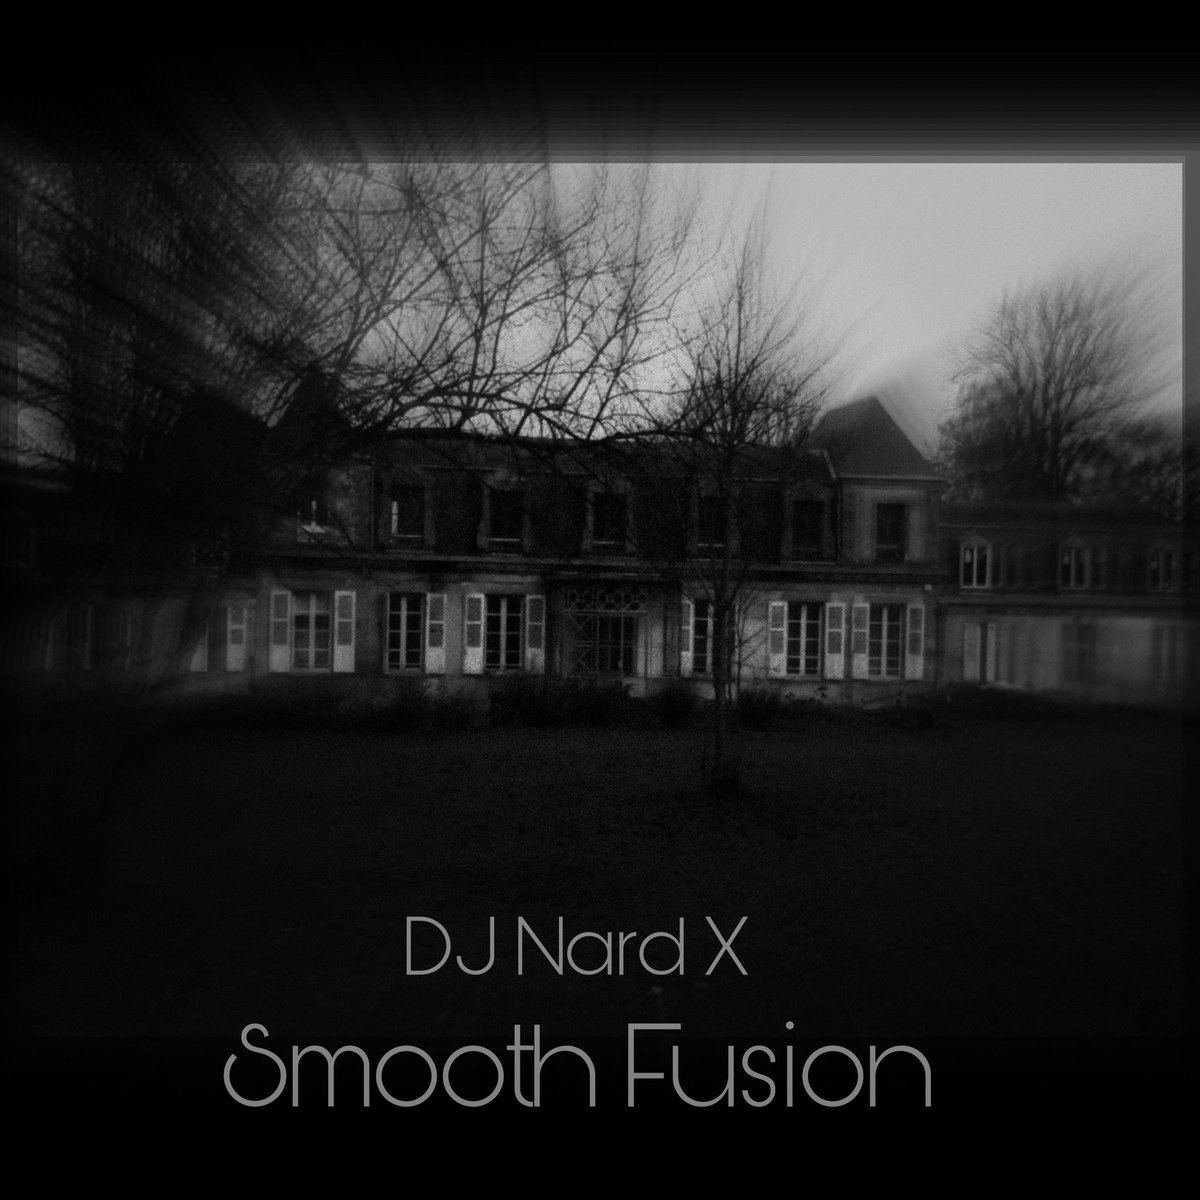 Smooth Fusion by DJ Nard X